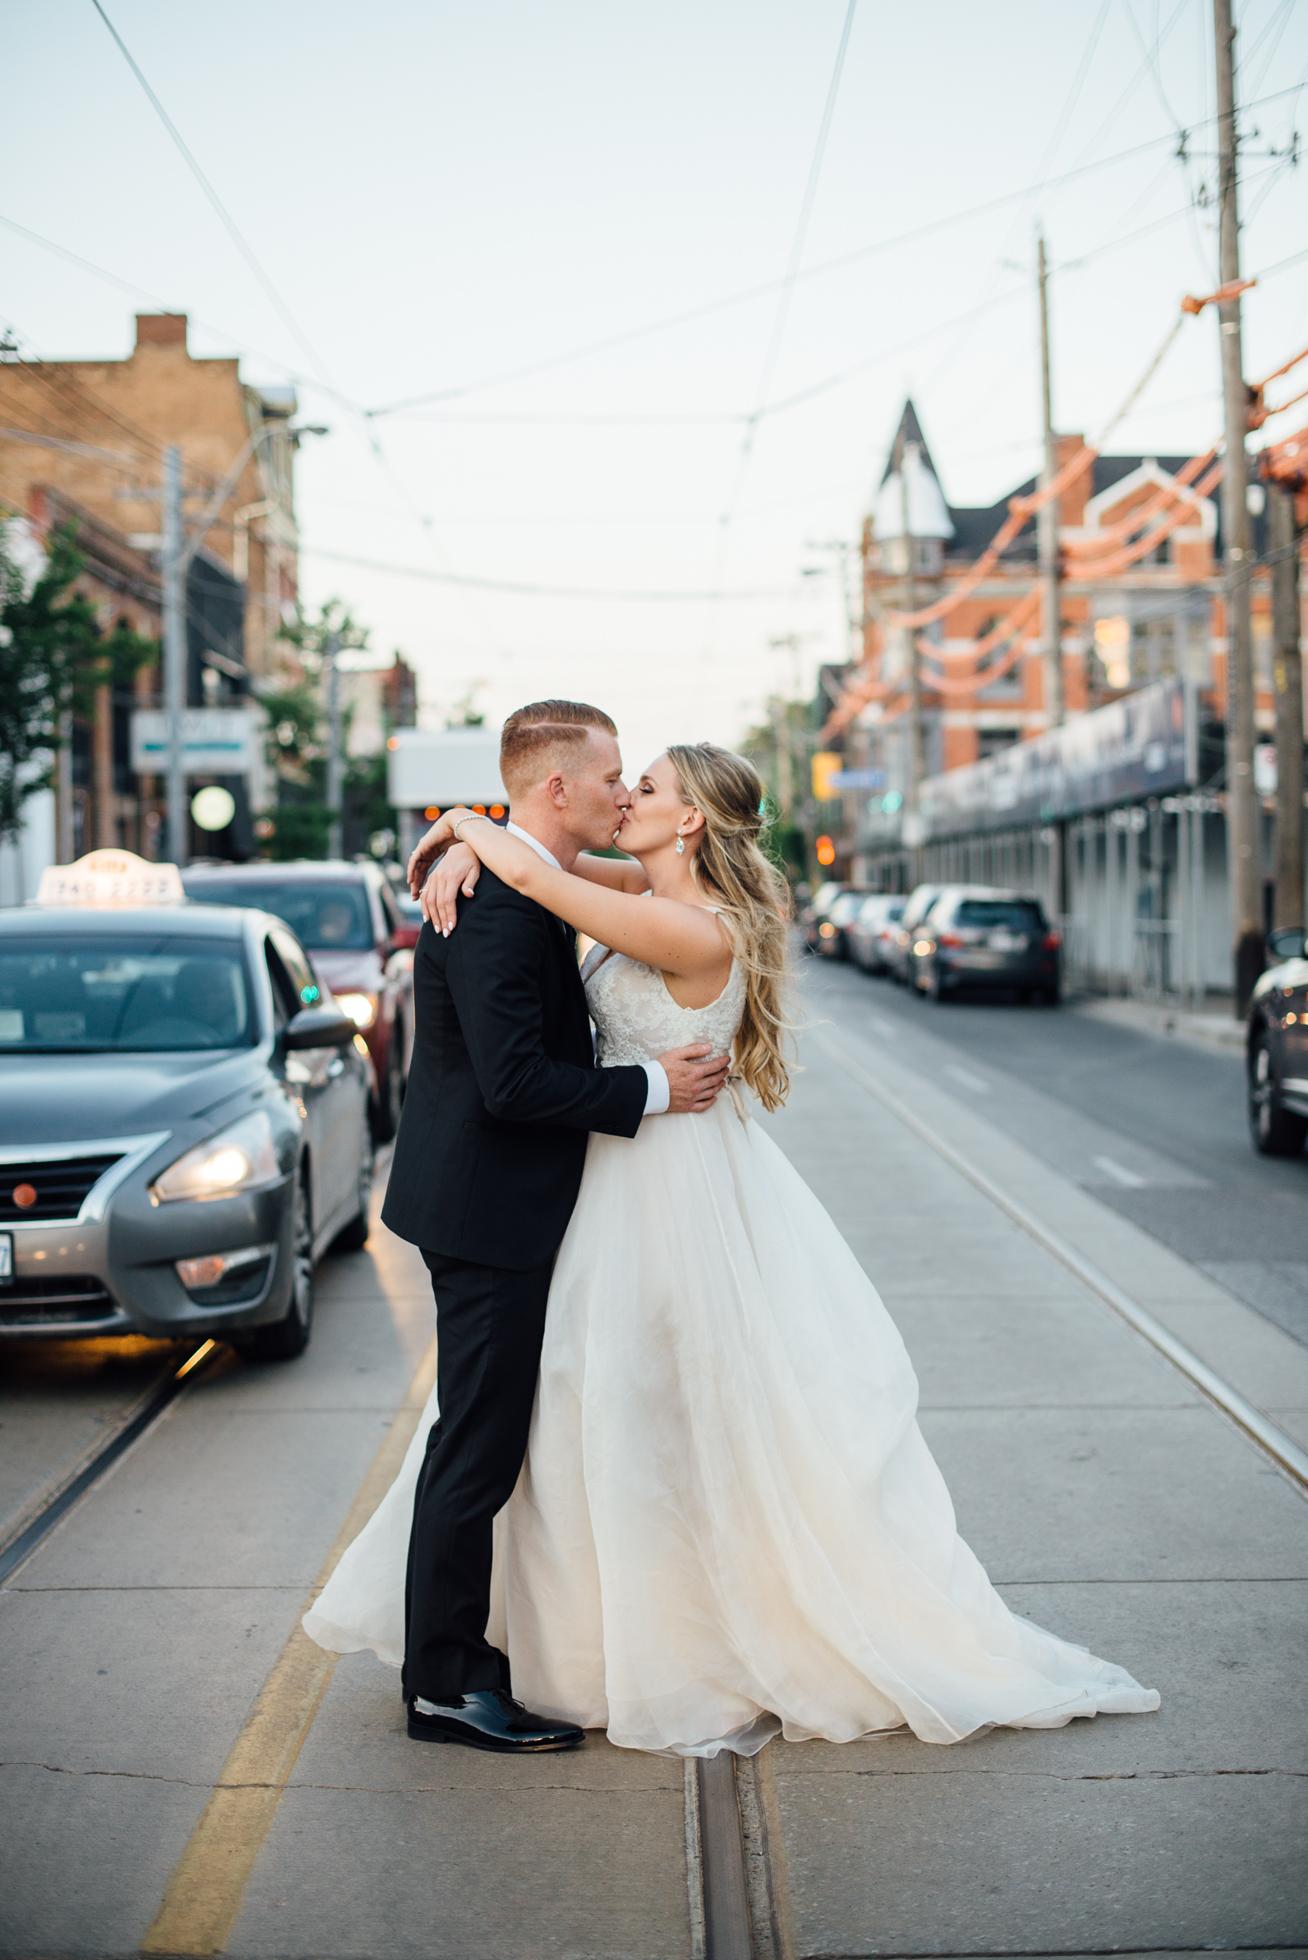 99-Sudbury-Toronto-Wedding-Photography-67.jpg